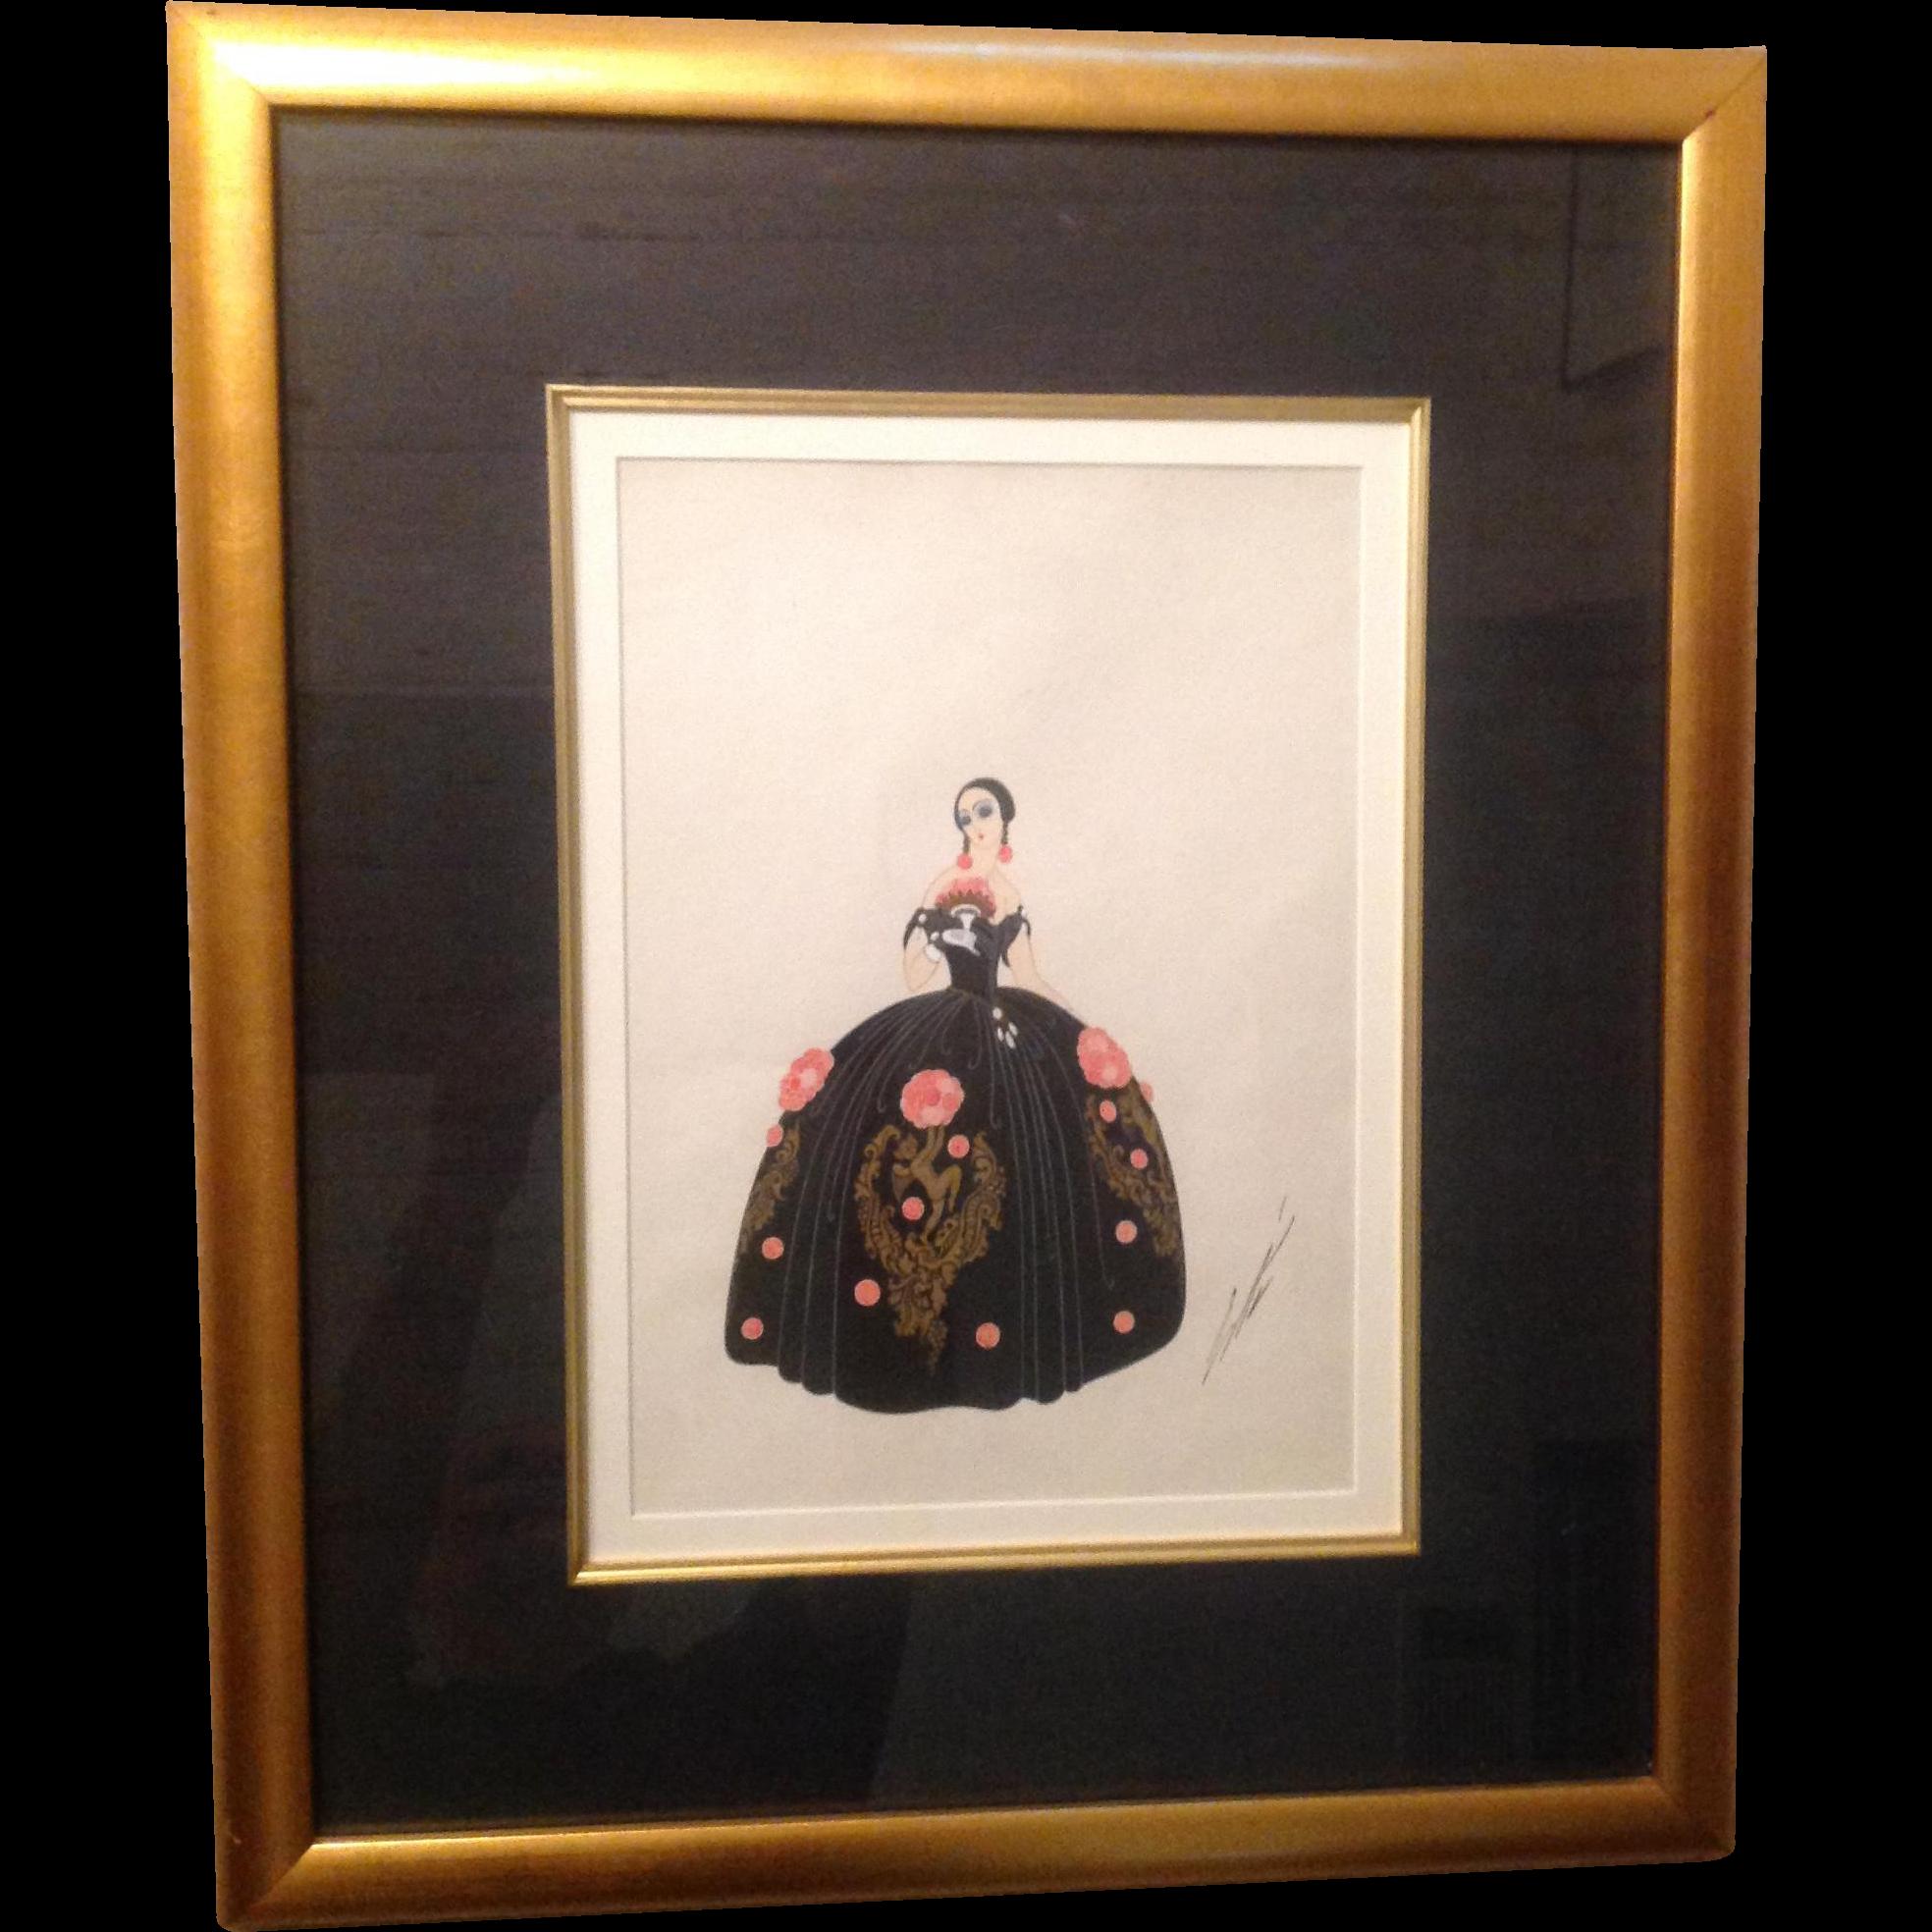 Original Erte Gouache Painting 1928 La Traviata Opera Dress Design Signed *RARE*